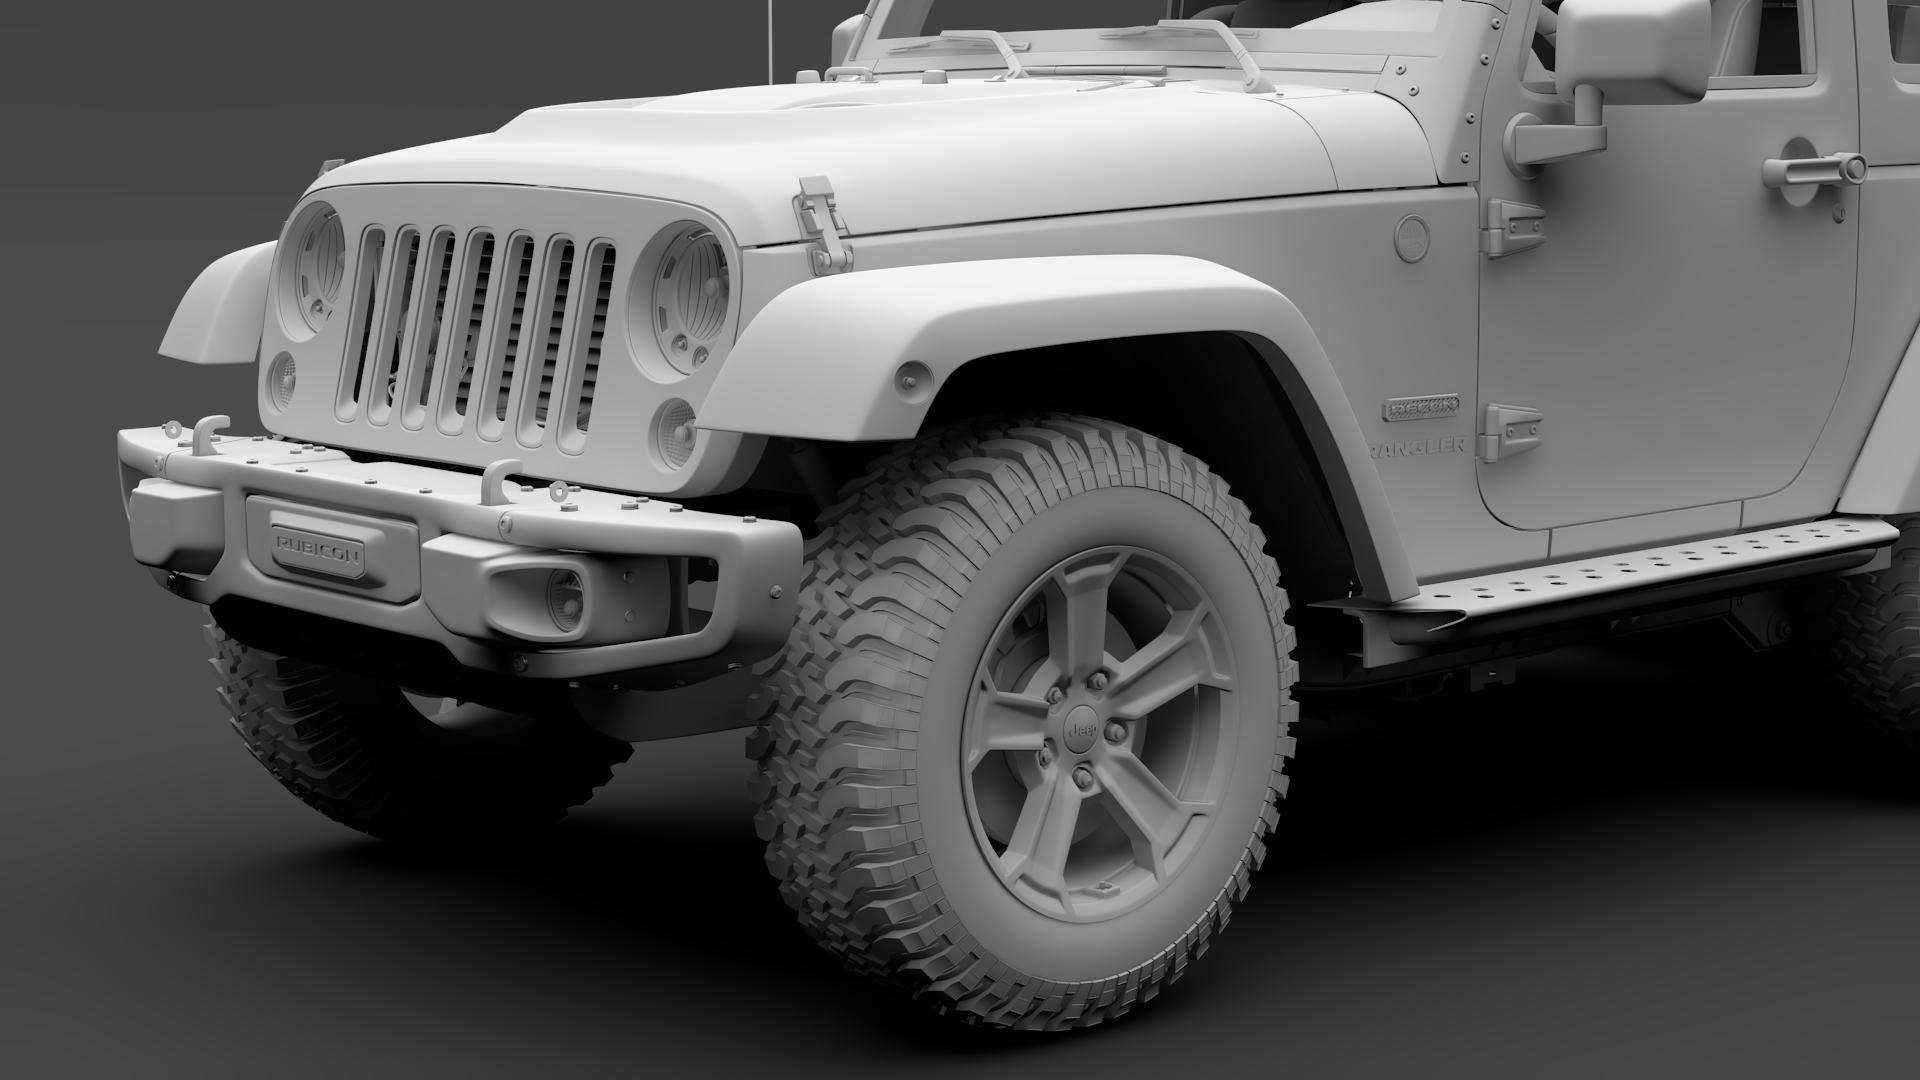 jeep wrangler 6×6 rubicon recon jk 2017 3d model max fbx c4d lwo ma mb hrc xsi obj 276857